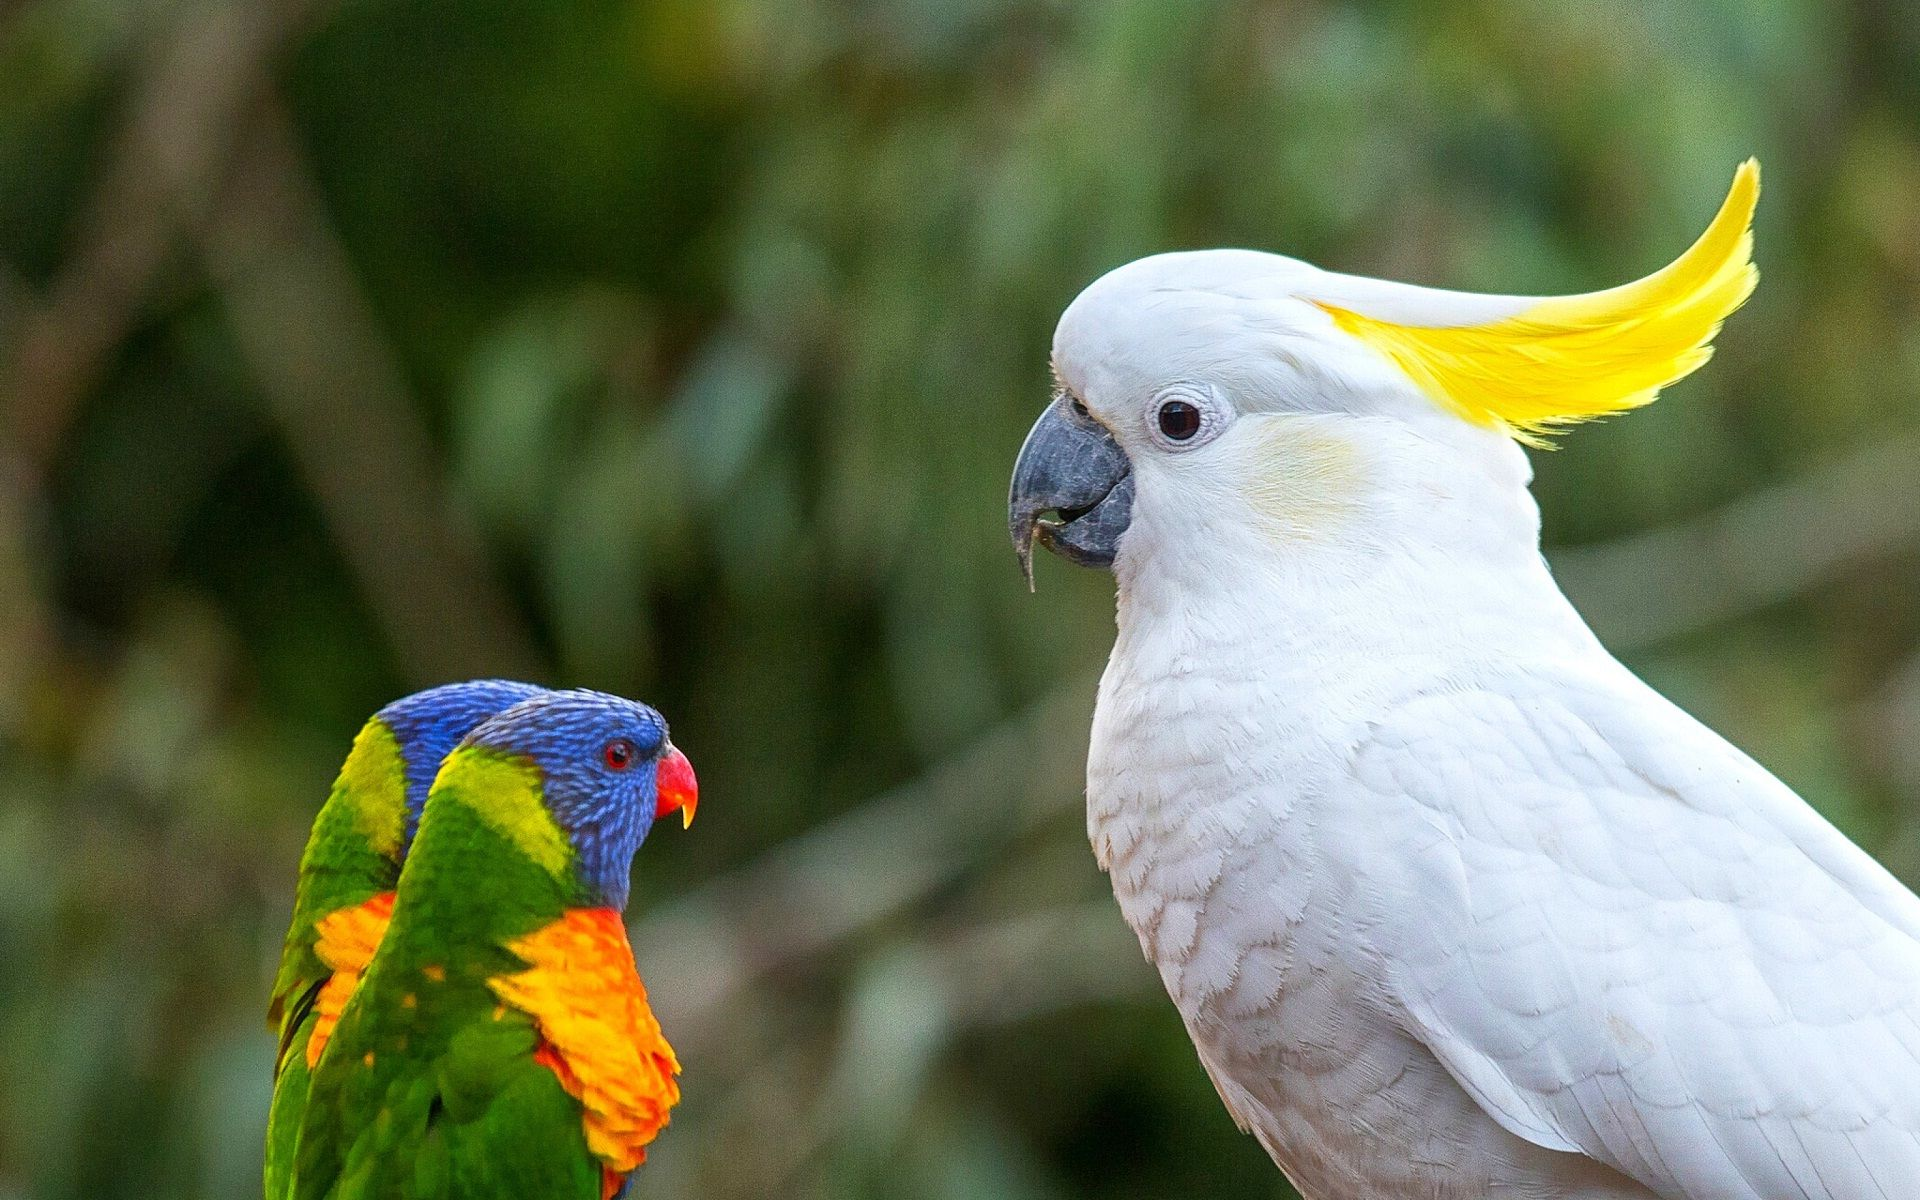 images of parrot bird